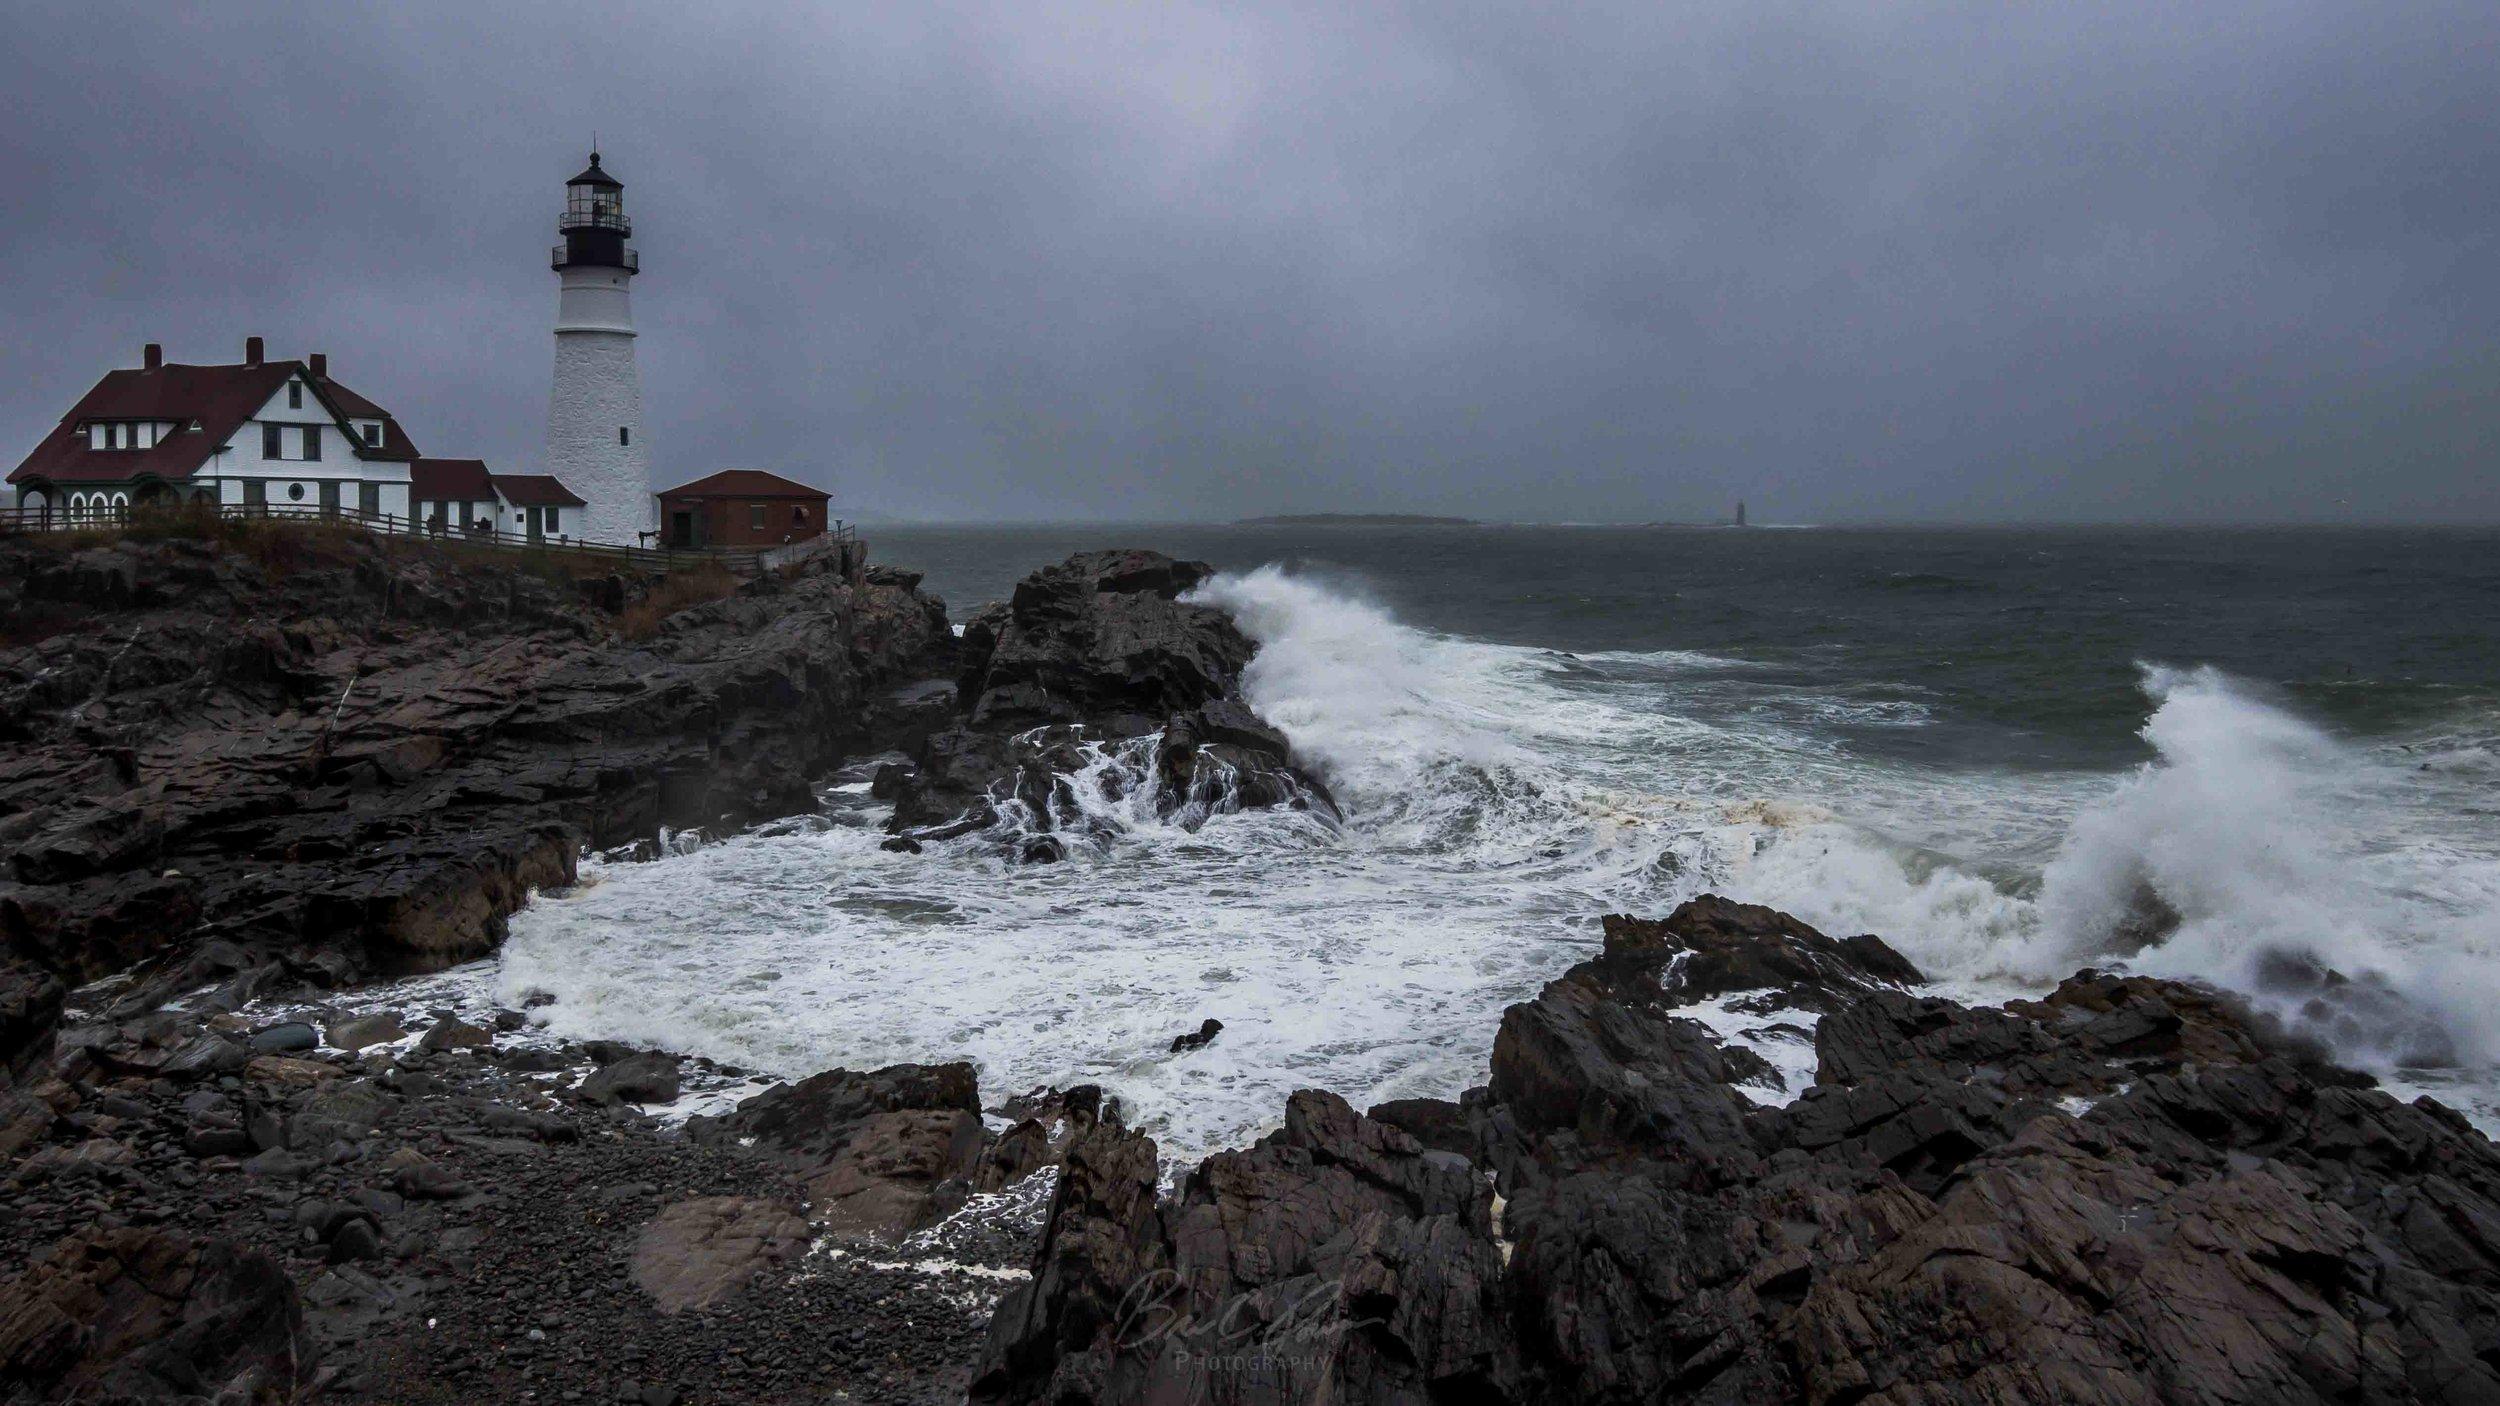 Storm Surge Creating Waves at Portland Head Light, Cape Elizabeth, Maine